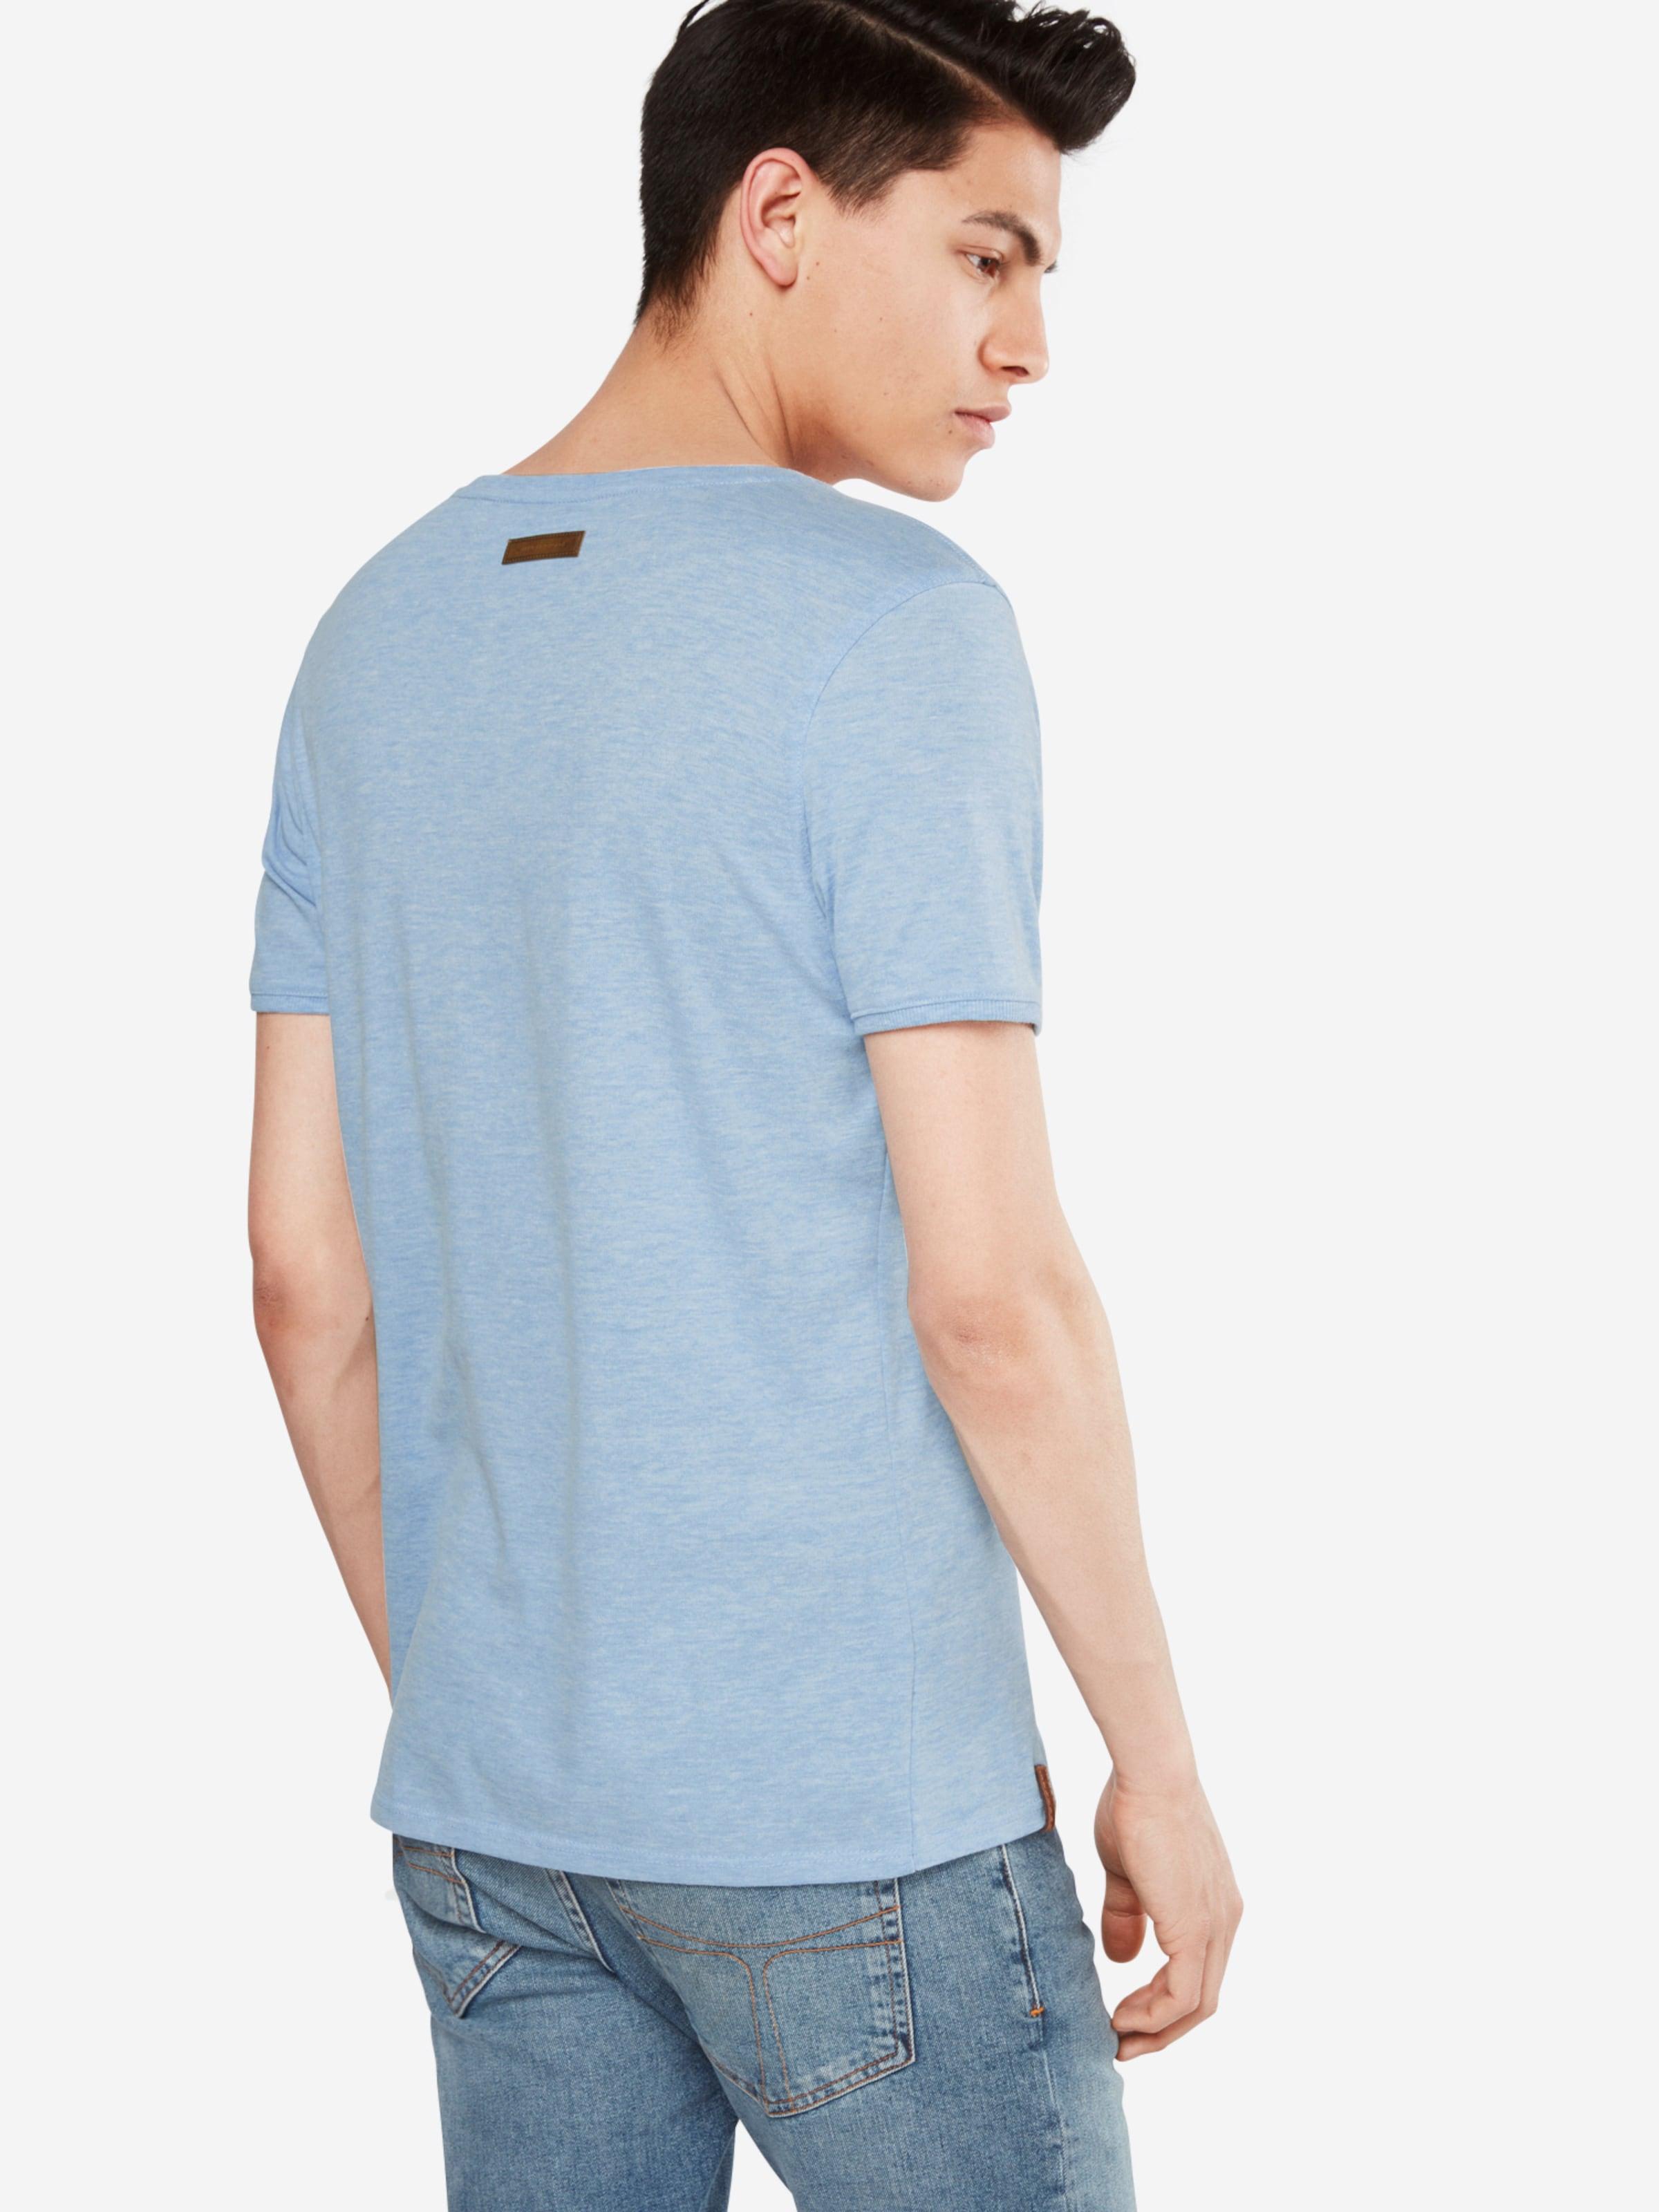 Shirt naketano T gesagt naketano T IV' 'Gelinde nT8nSHqBO